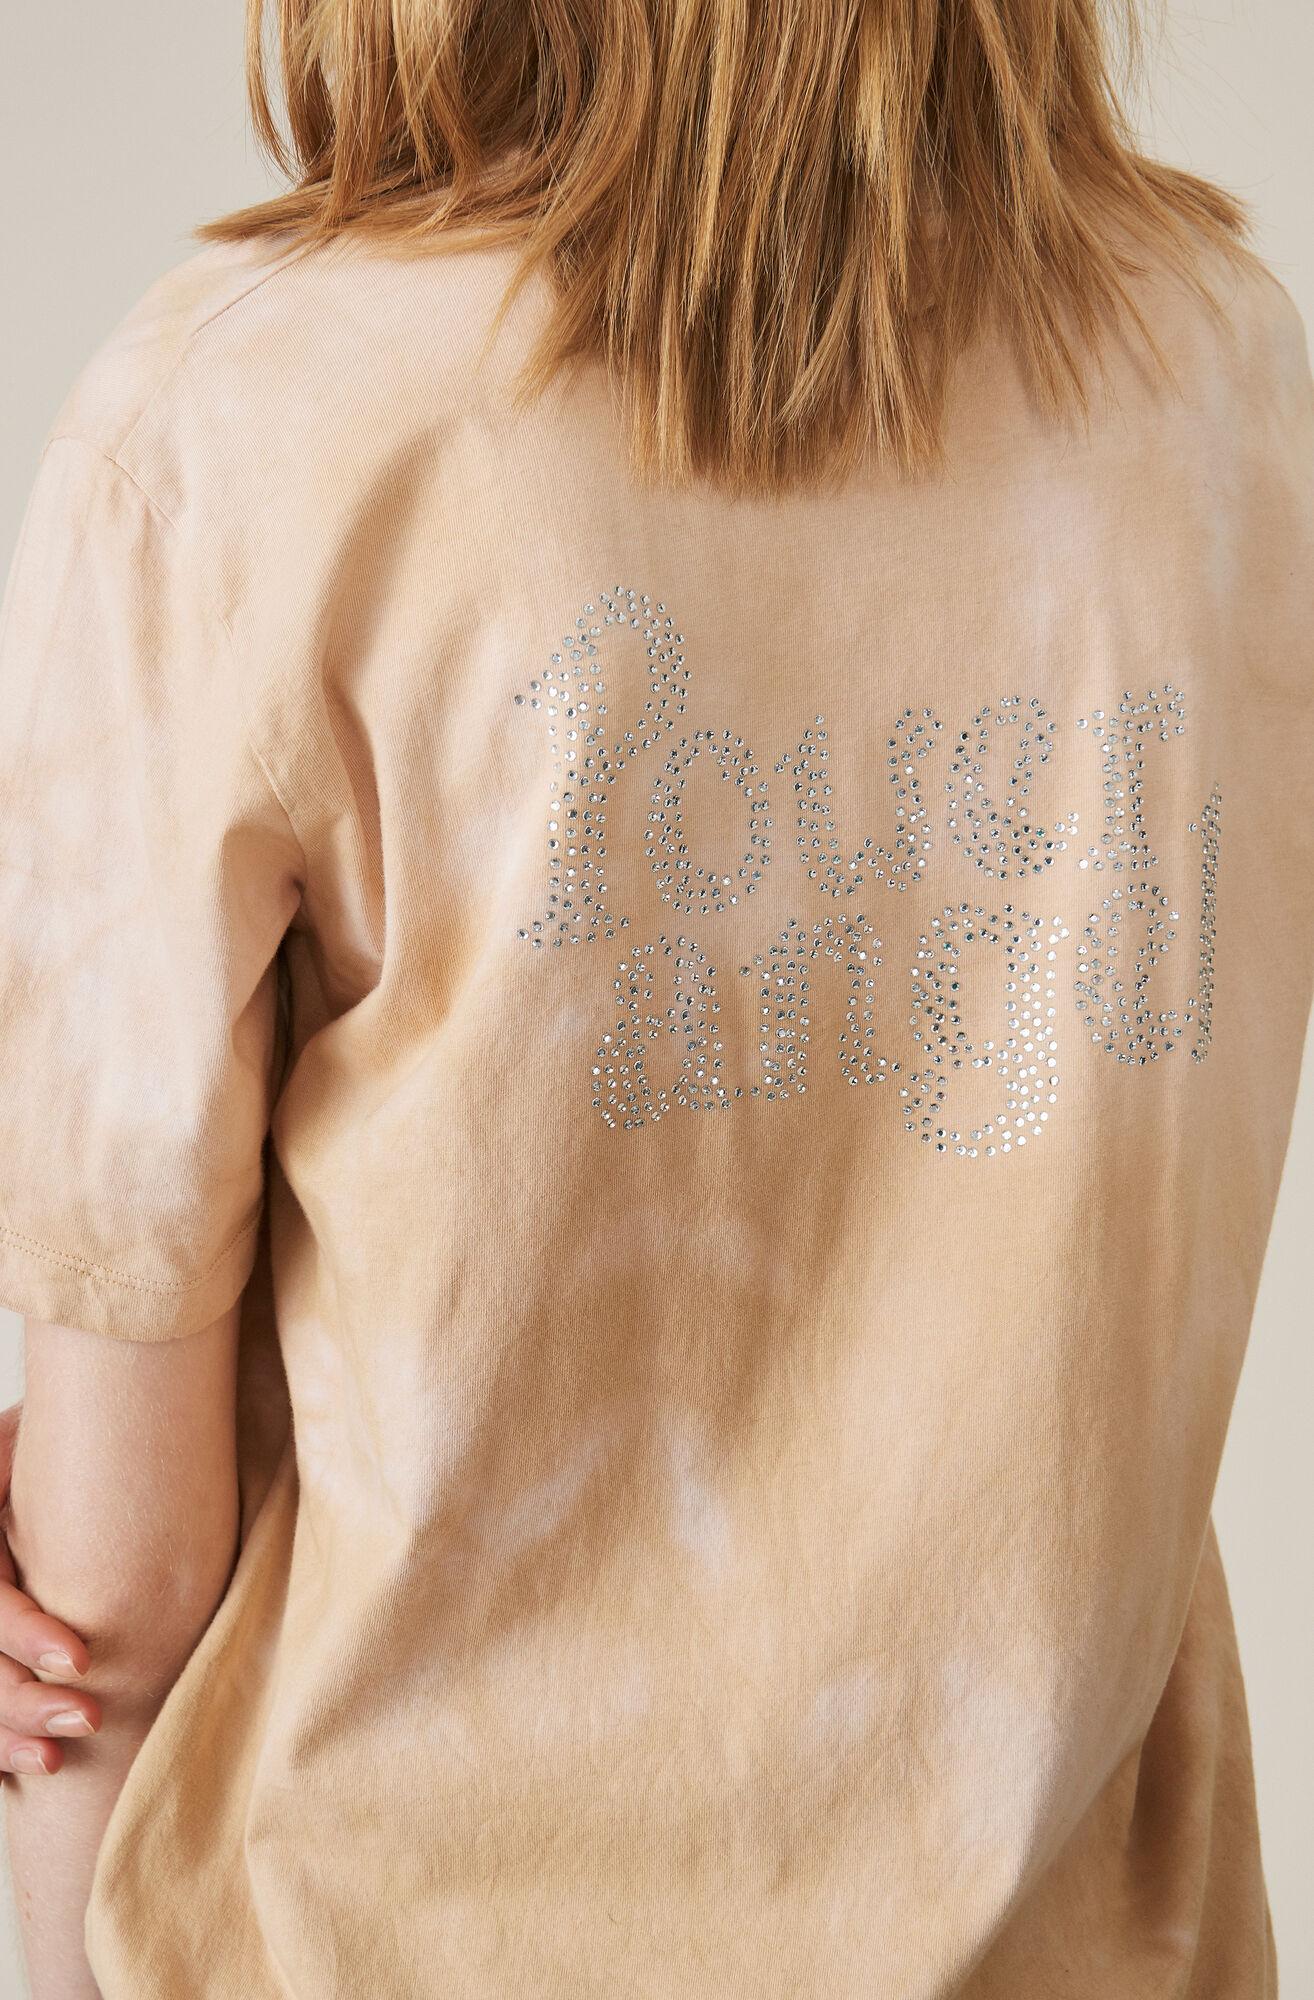 Ginsbourg T-shirt, Power Angel, Hazelnut, hi-res